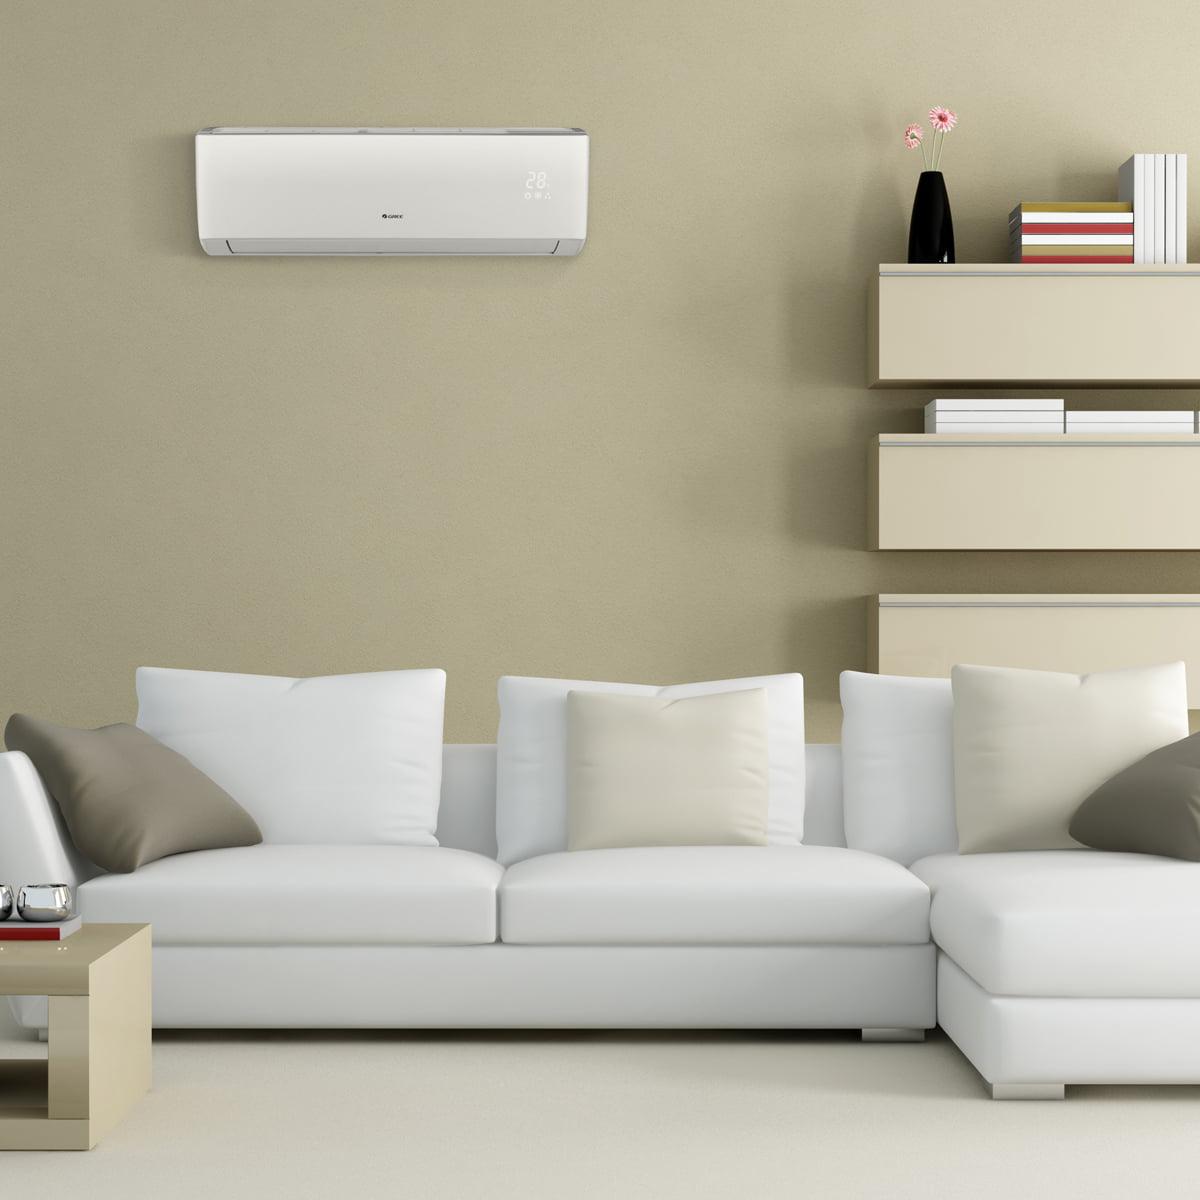 Dual-Zone Wall Mount Mini Split Air Conditioner Heat Pump 208-230V 9-18 GREE MULTI24CLIV202-24,000 BTU Multi21